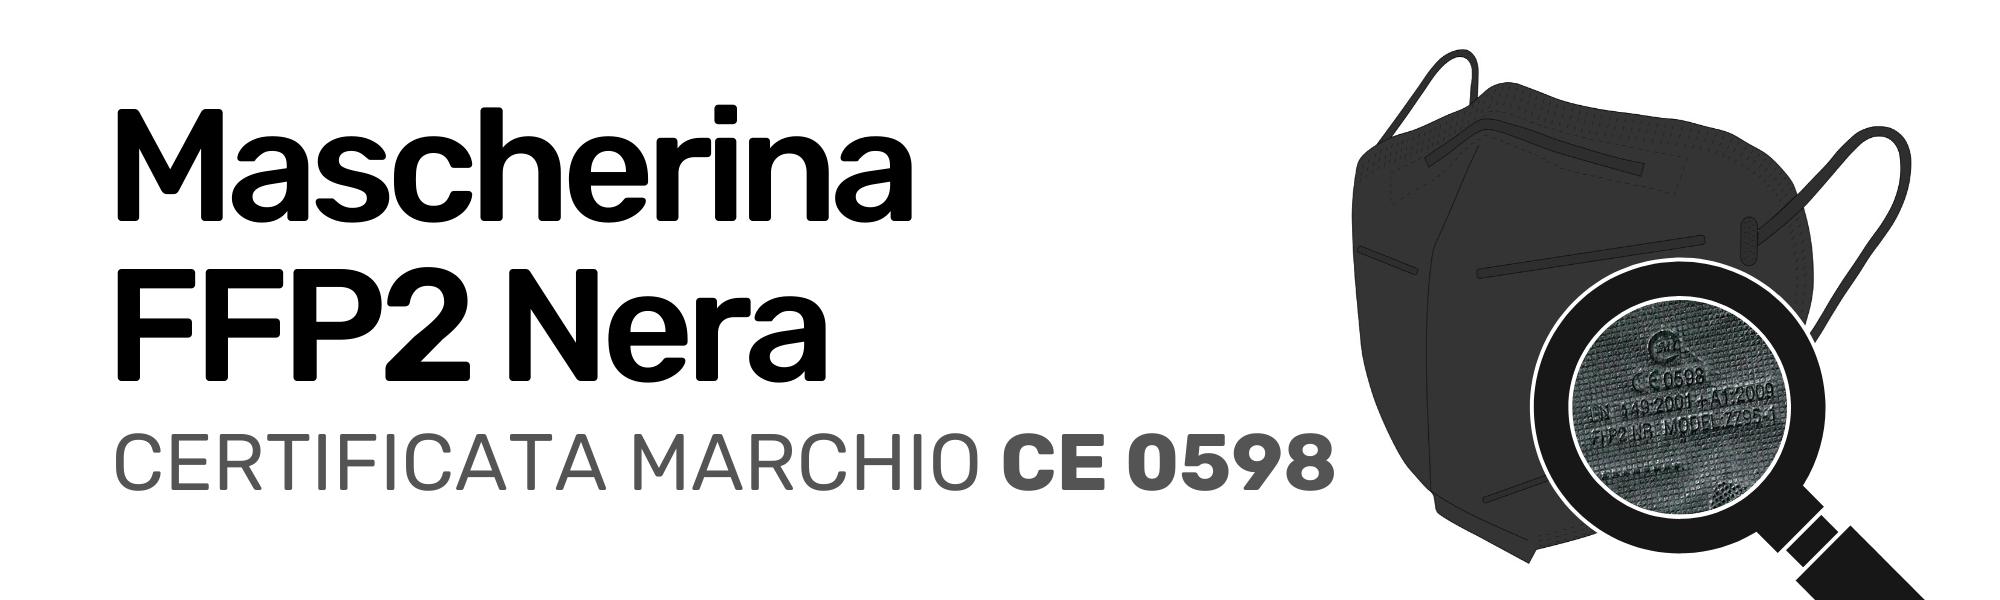 Mascherina FFP2 Nera Certificata CE 0598